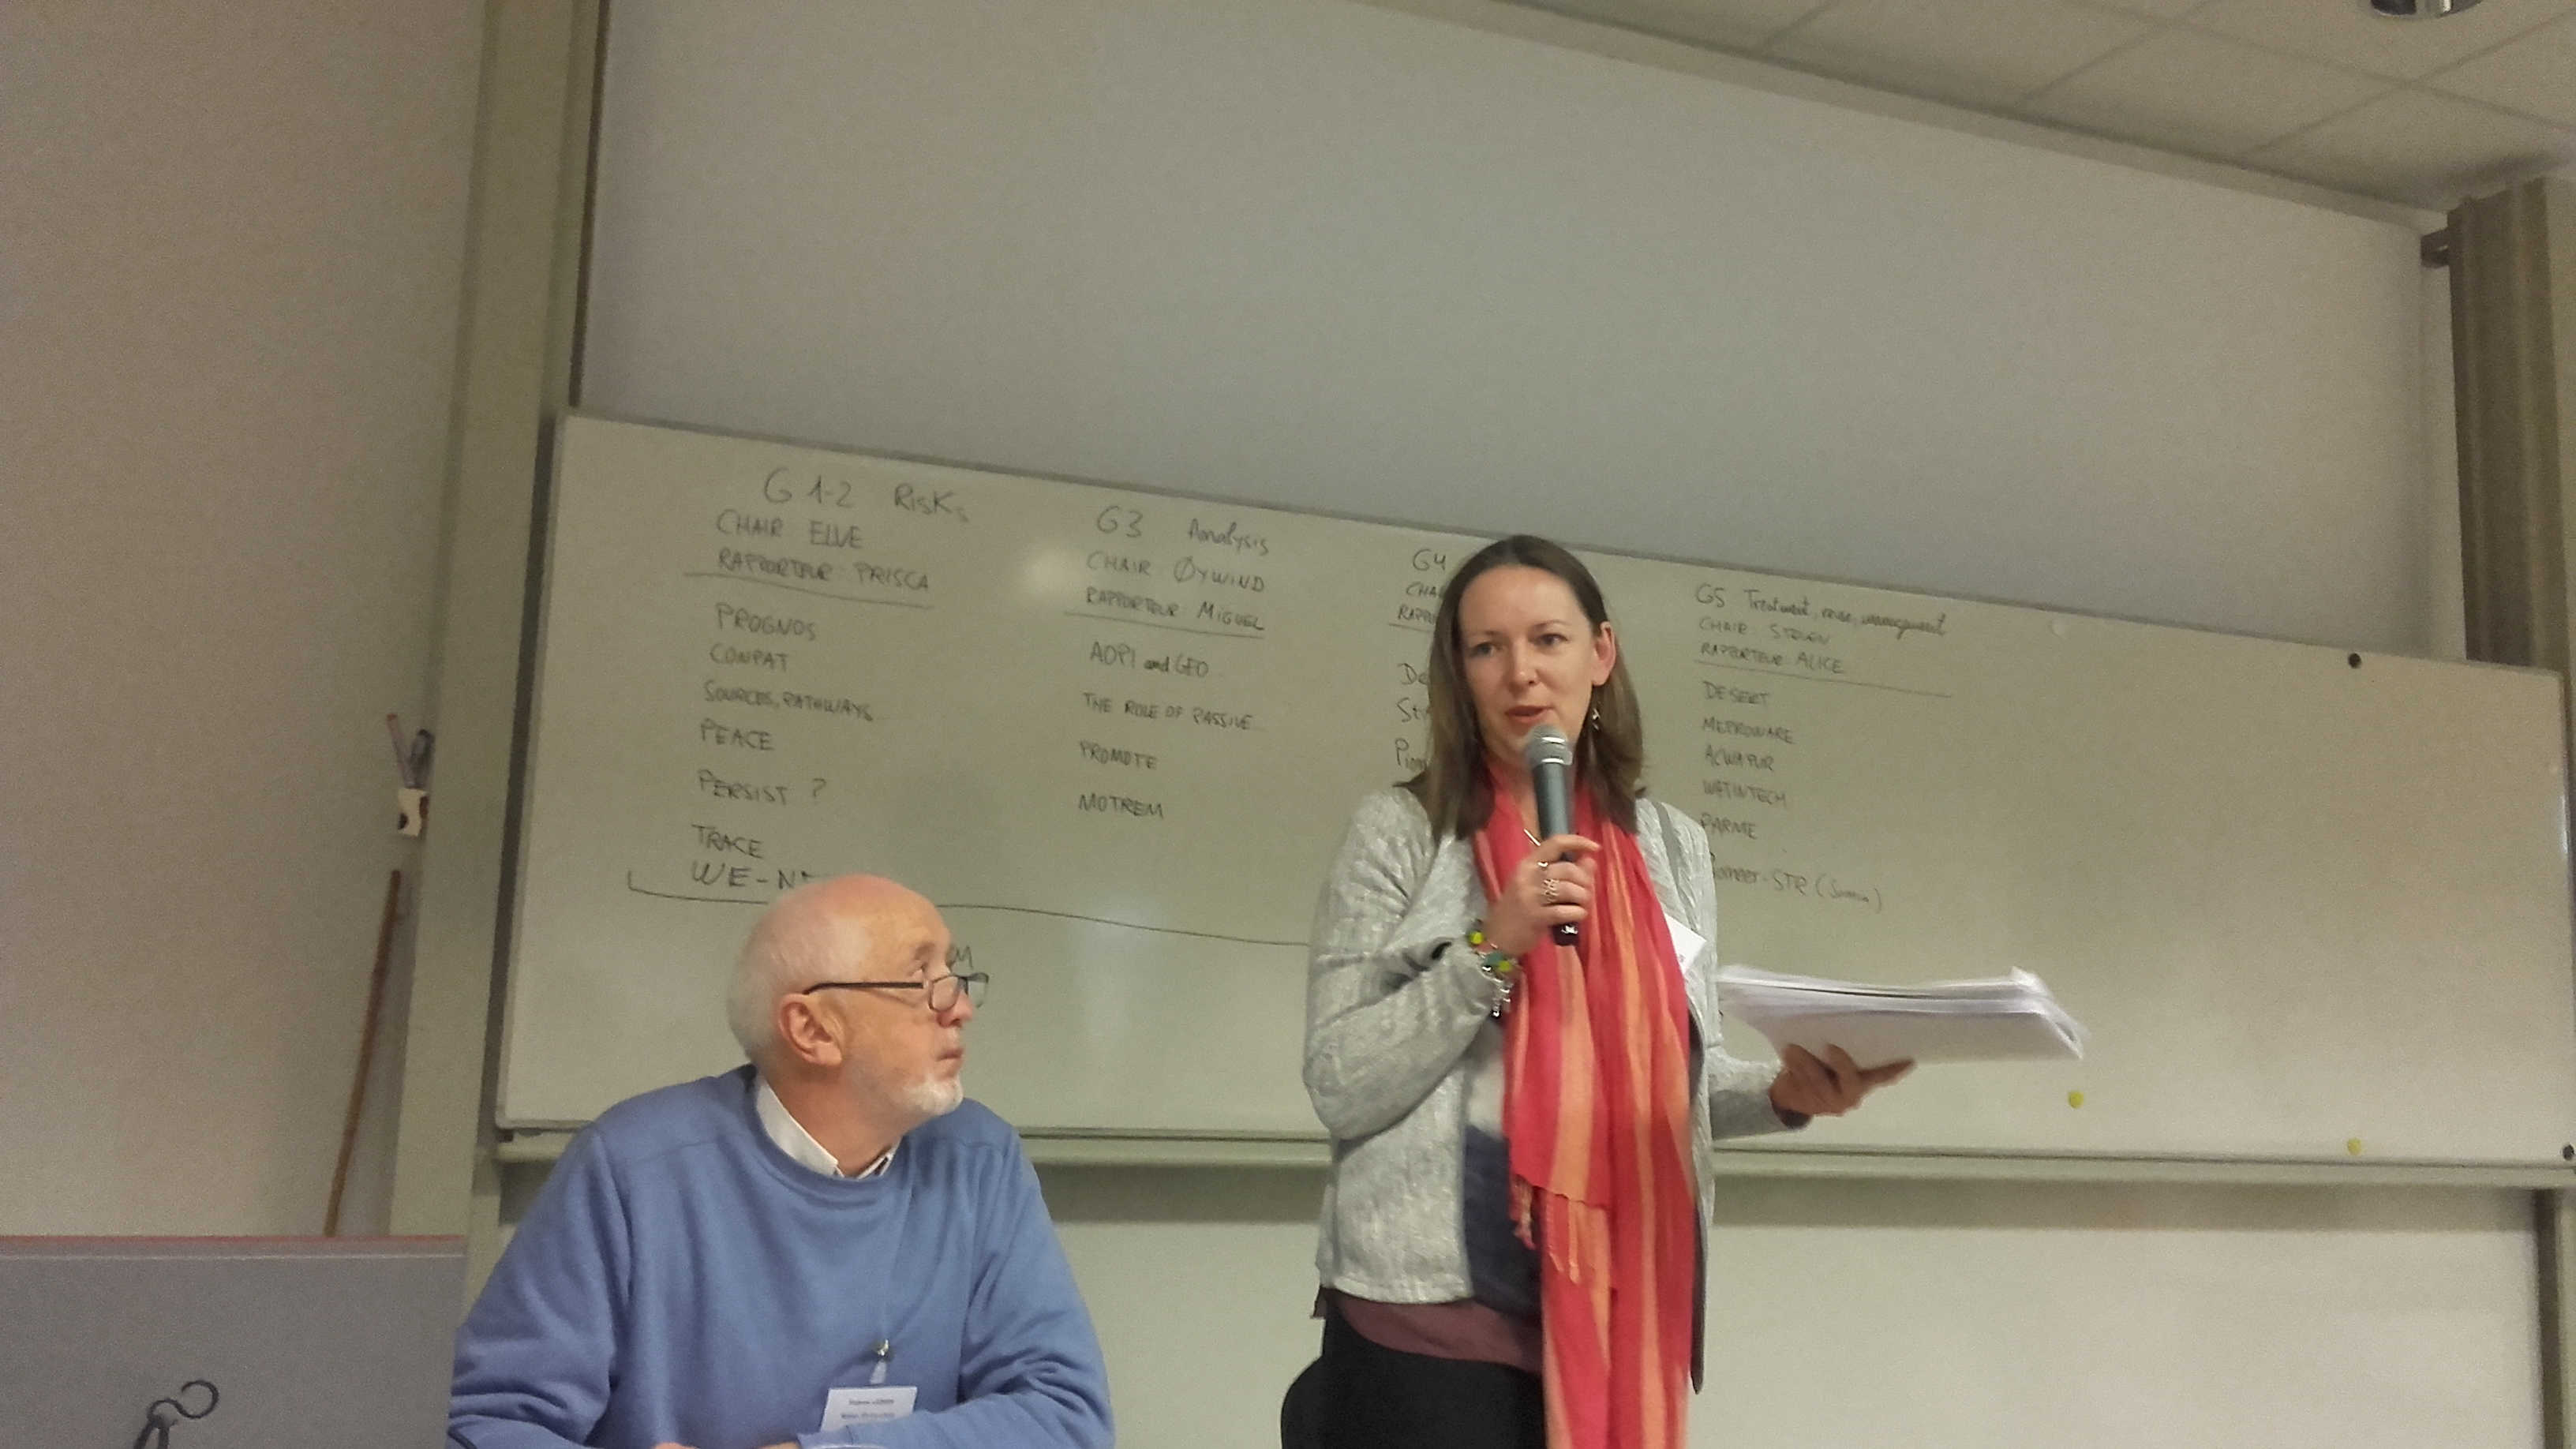 Rapporteur Alice Wemaere